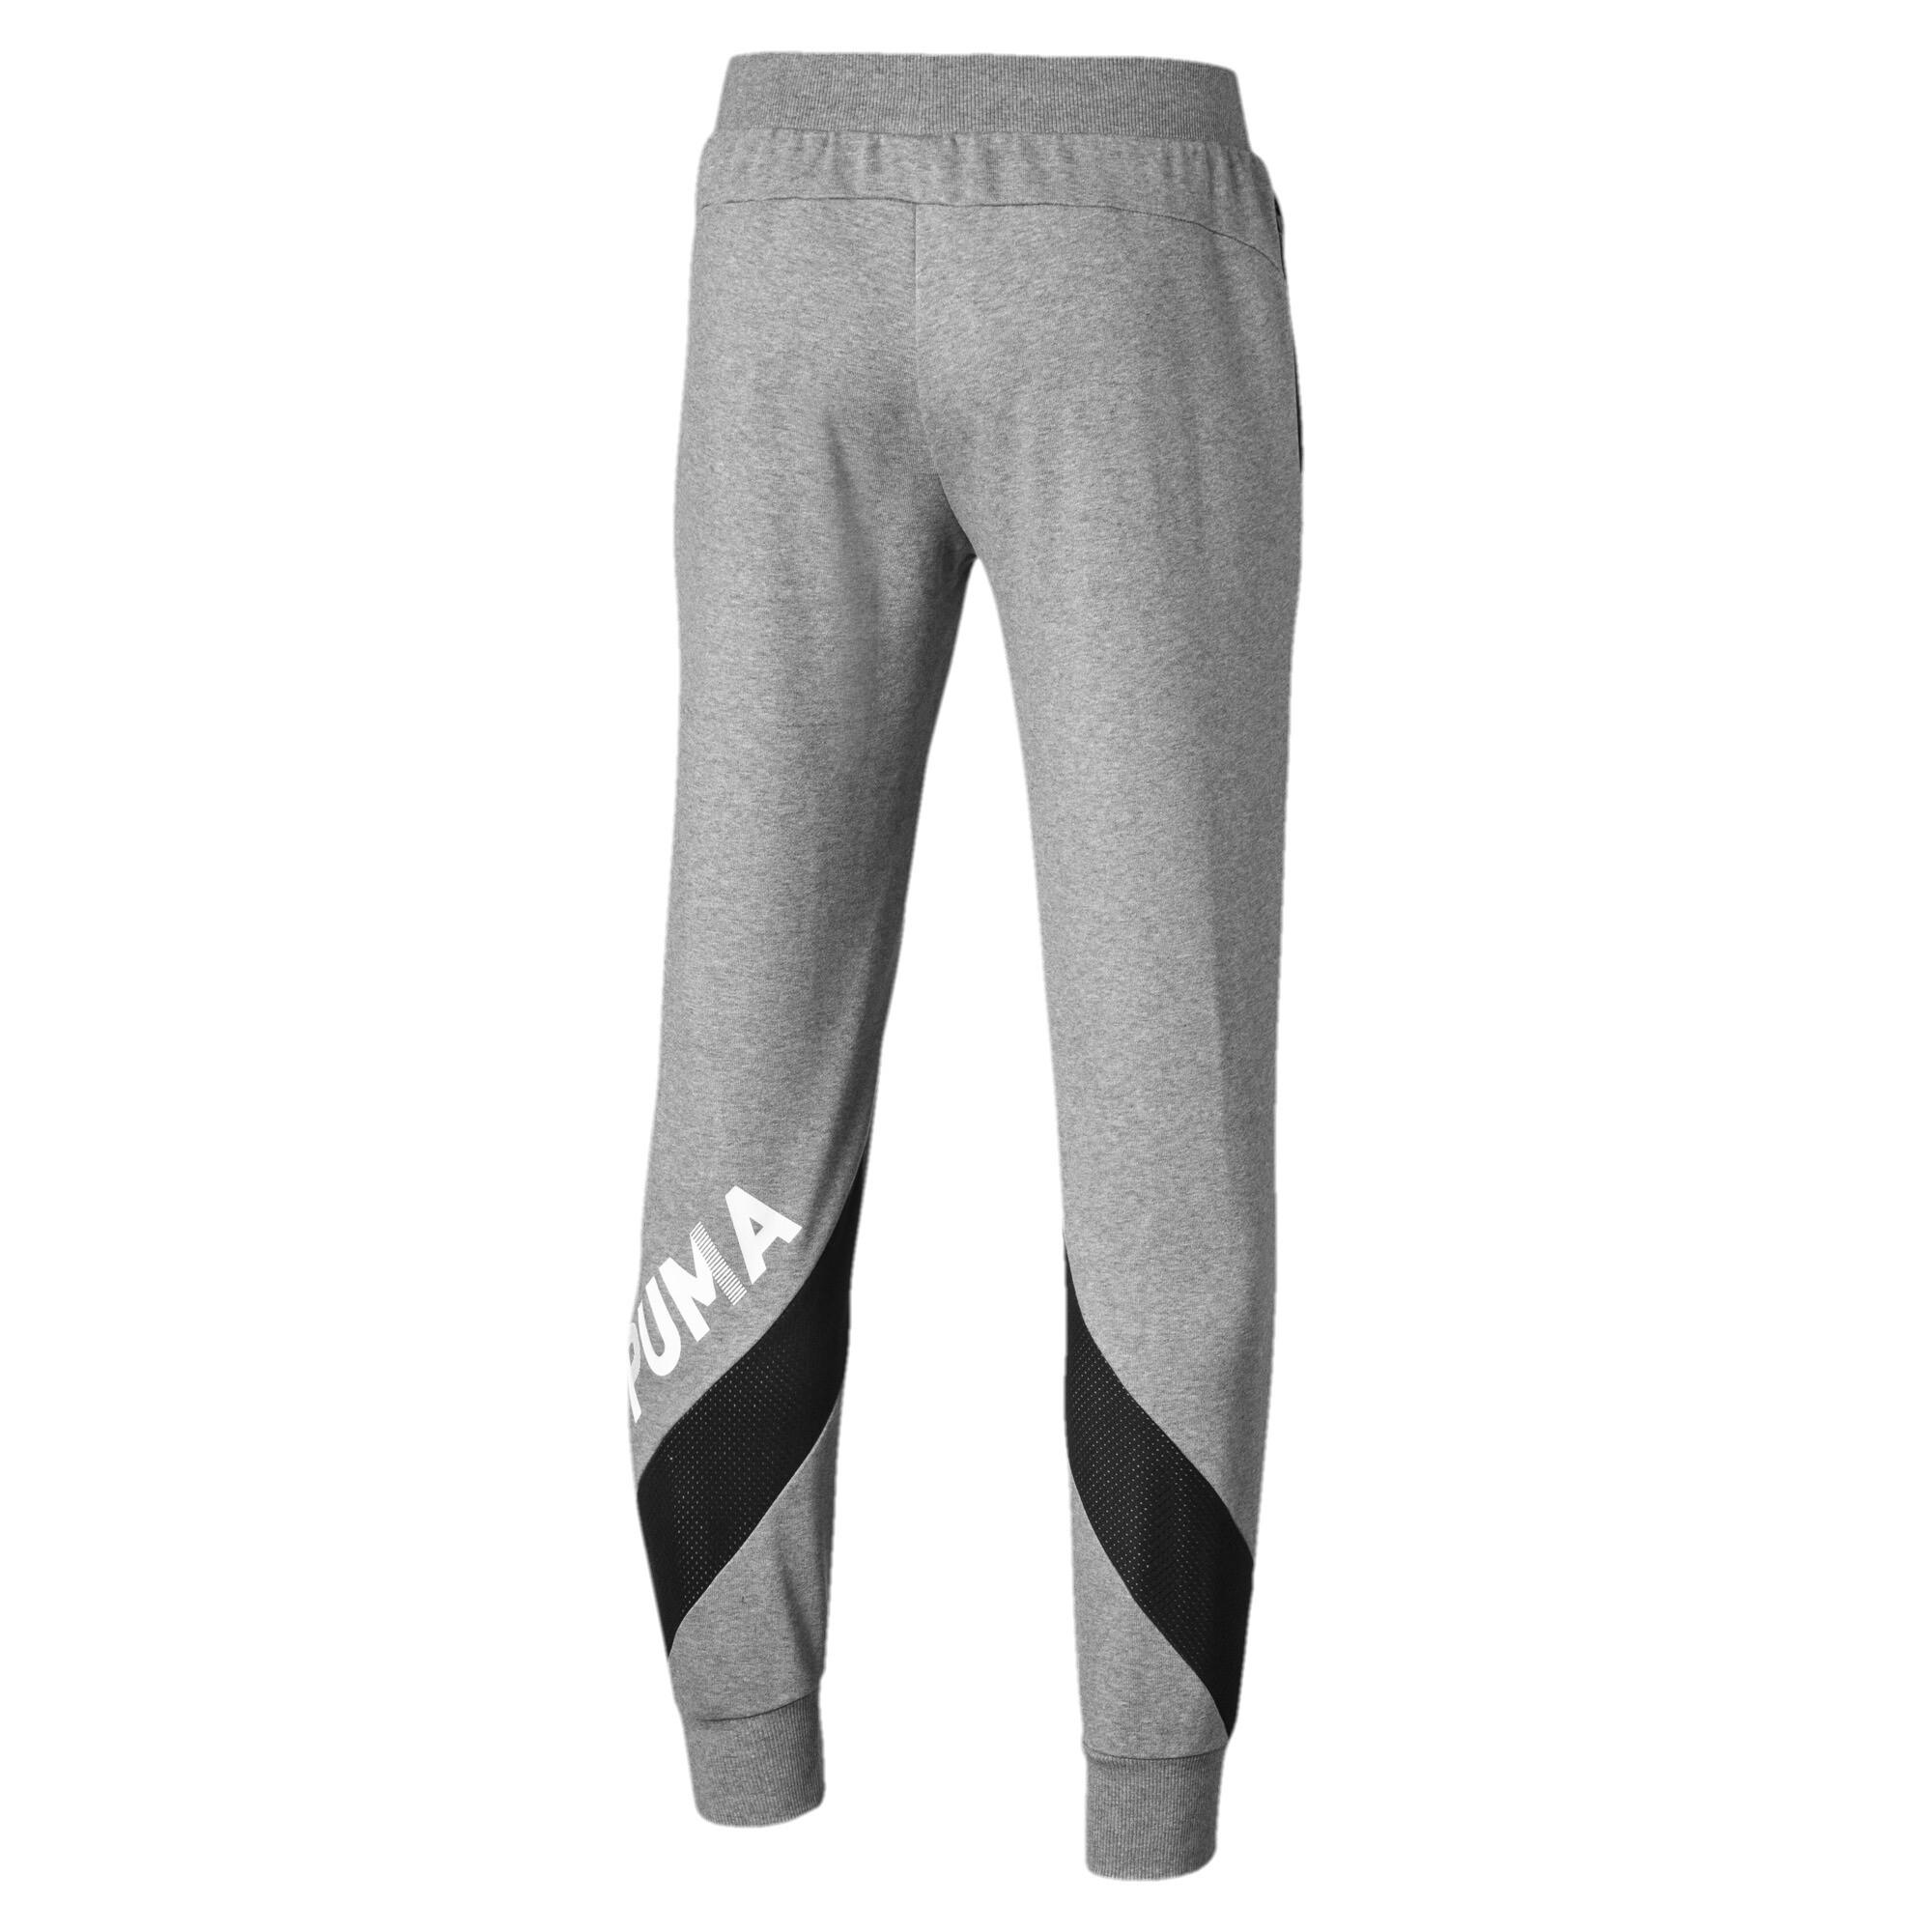 PUMA-Modern-Sports-Men-039-s-Sweatpants-Men-Knitted-Pants-Basics thumbnail 3